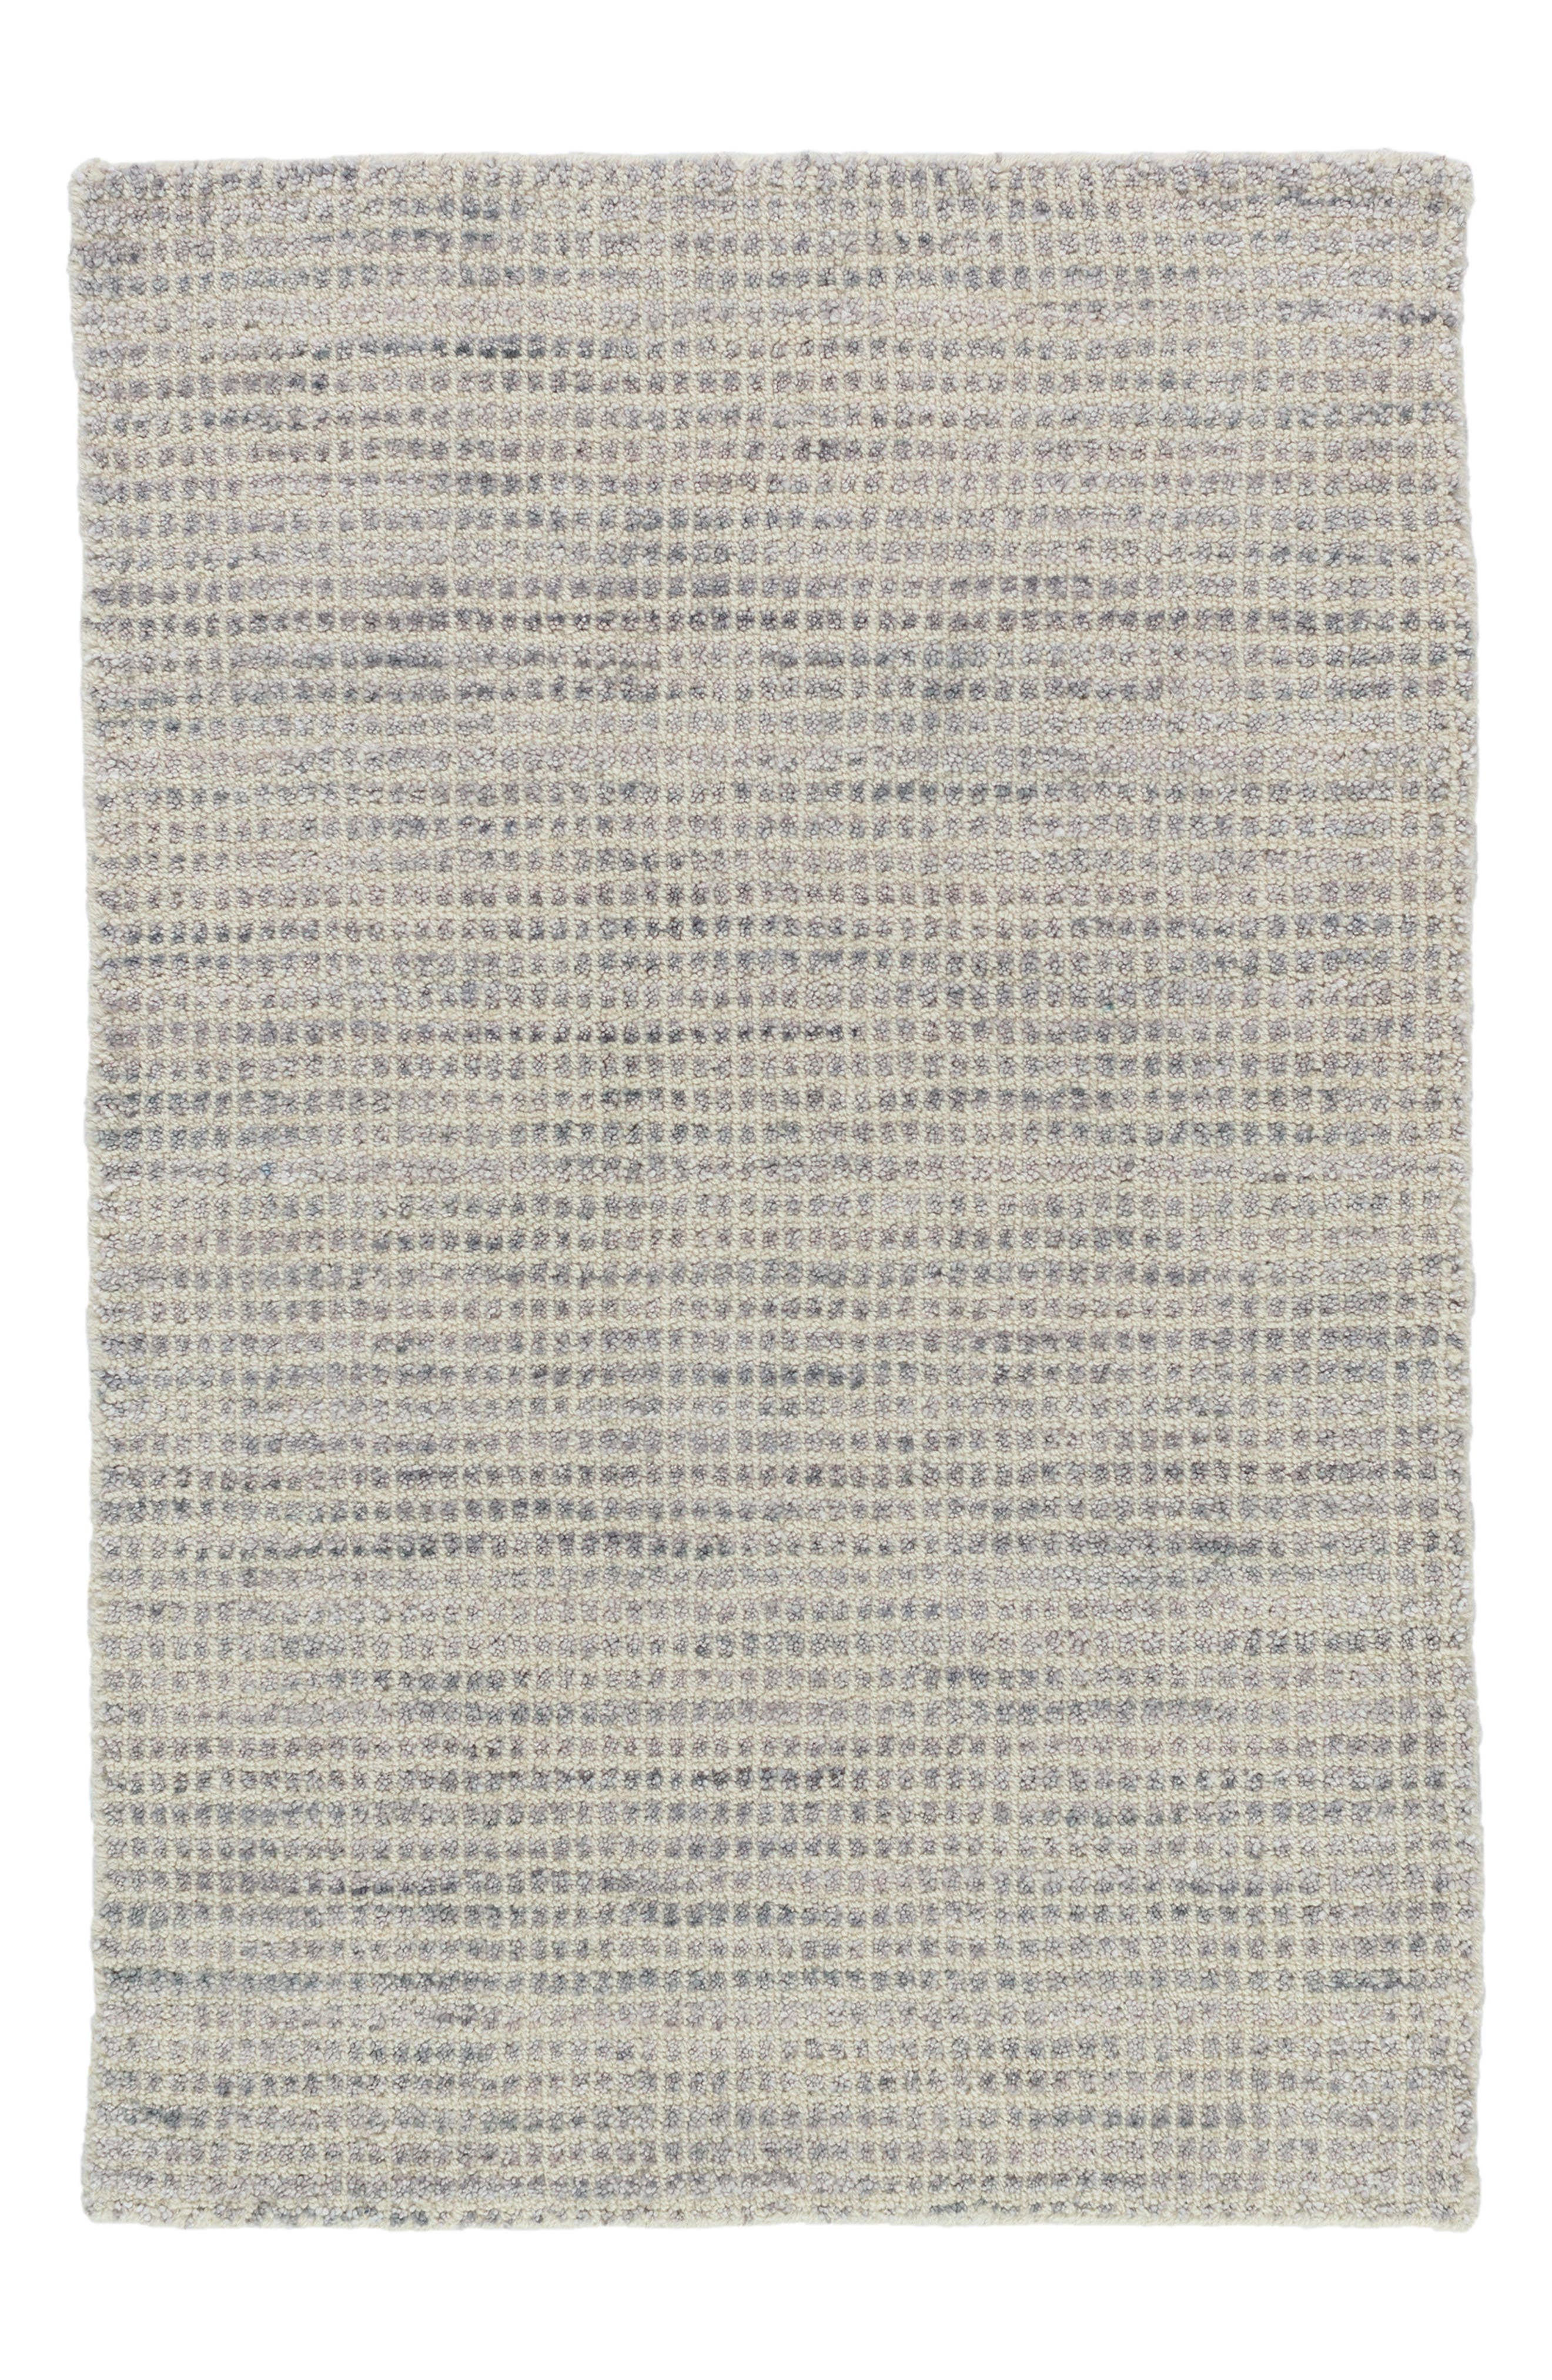 Main Image - Dash & Albert Homer Knotted Wool-Blend Rug